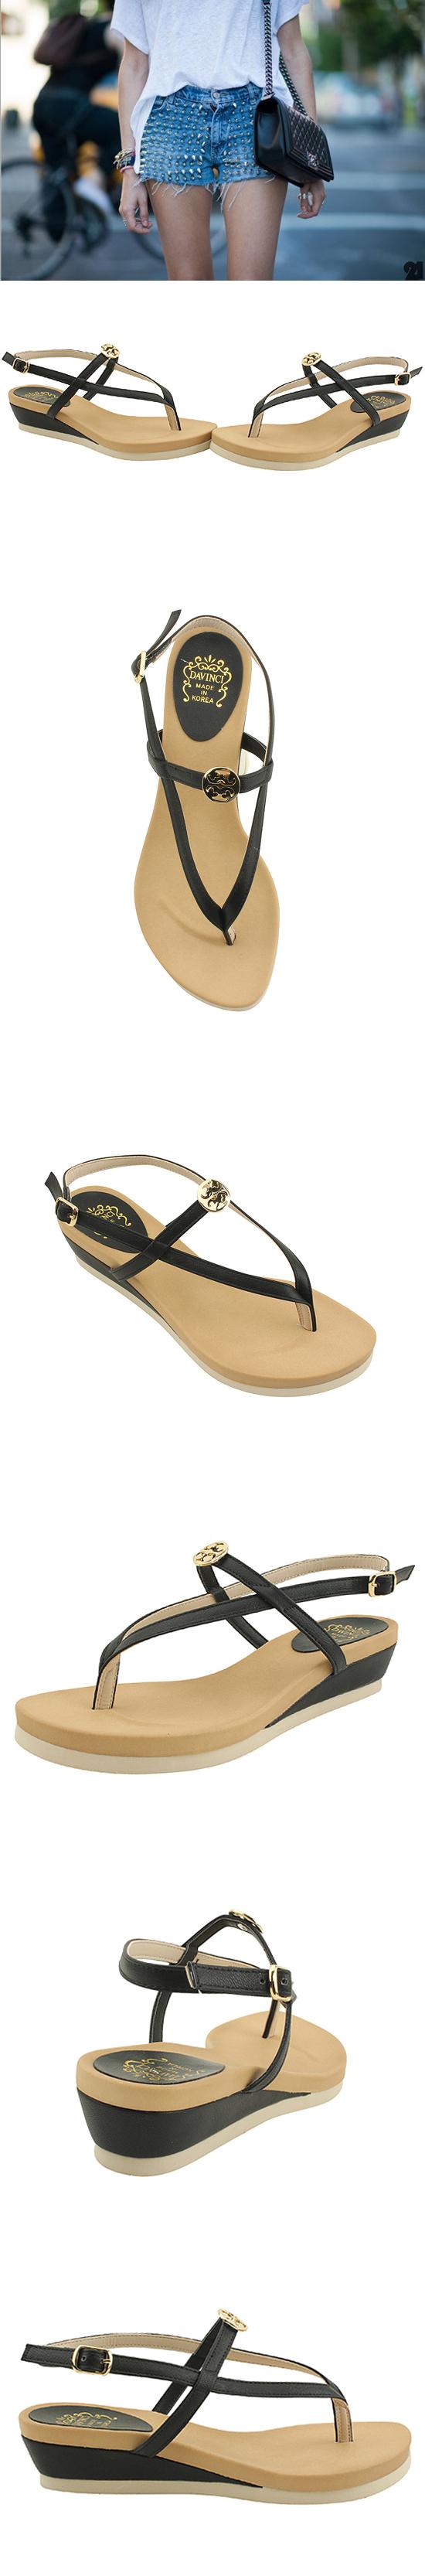 Flip-Flop Full Heel Flat Sandals 4cm Black